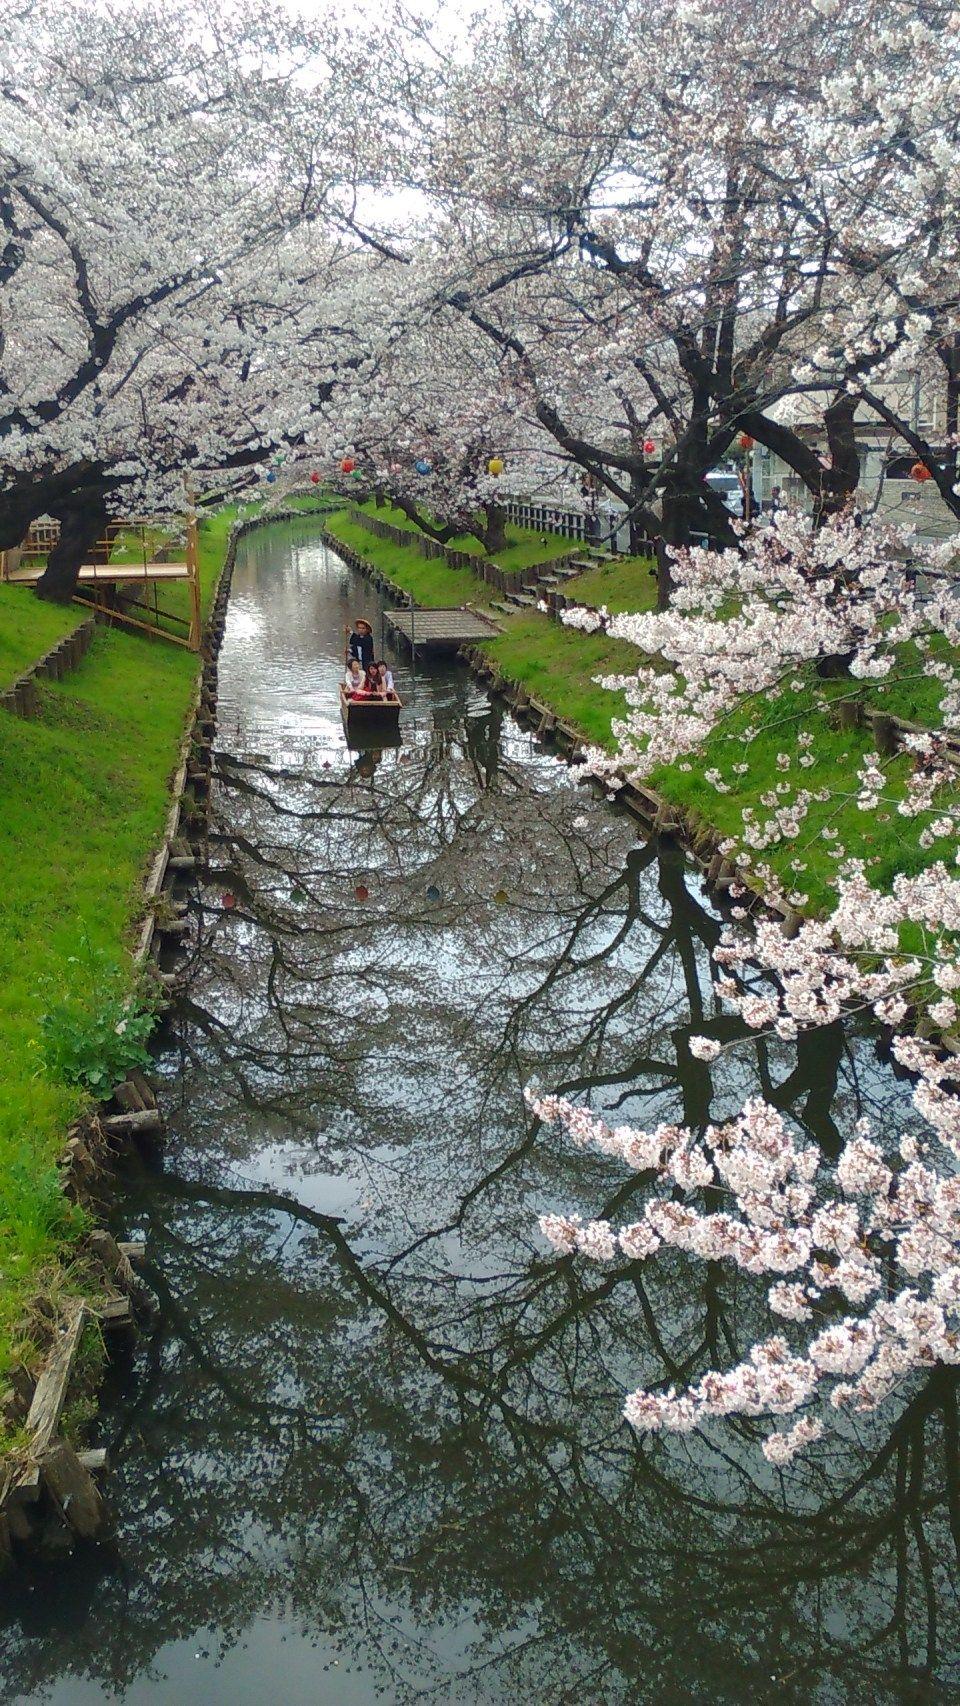 Cherry Blossoms Shingashi River Kawagoe In Saitama Cherry Blossom Japan Kawagoe Cherry Blossom